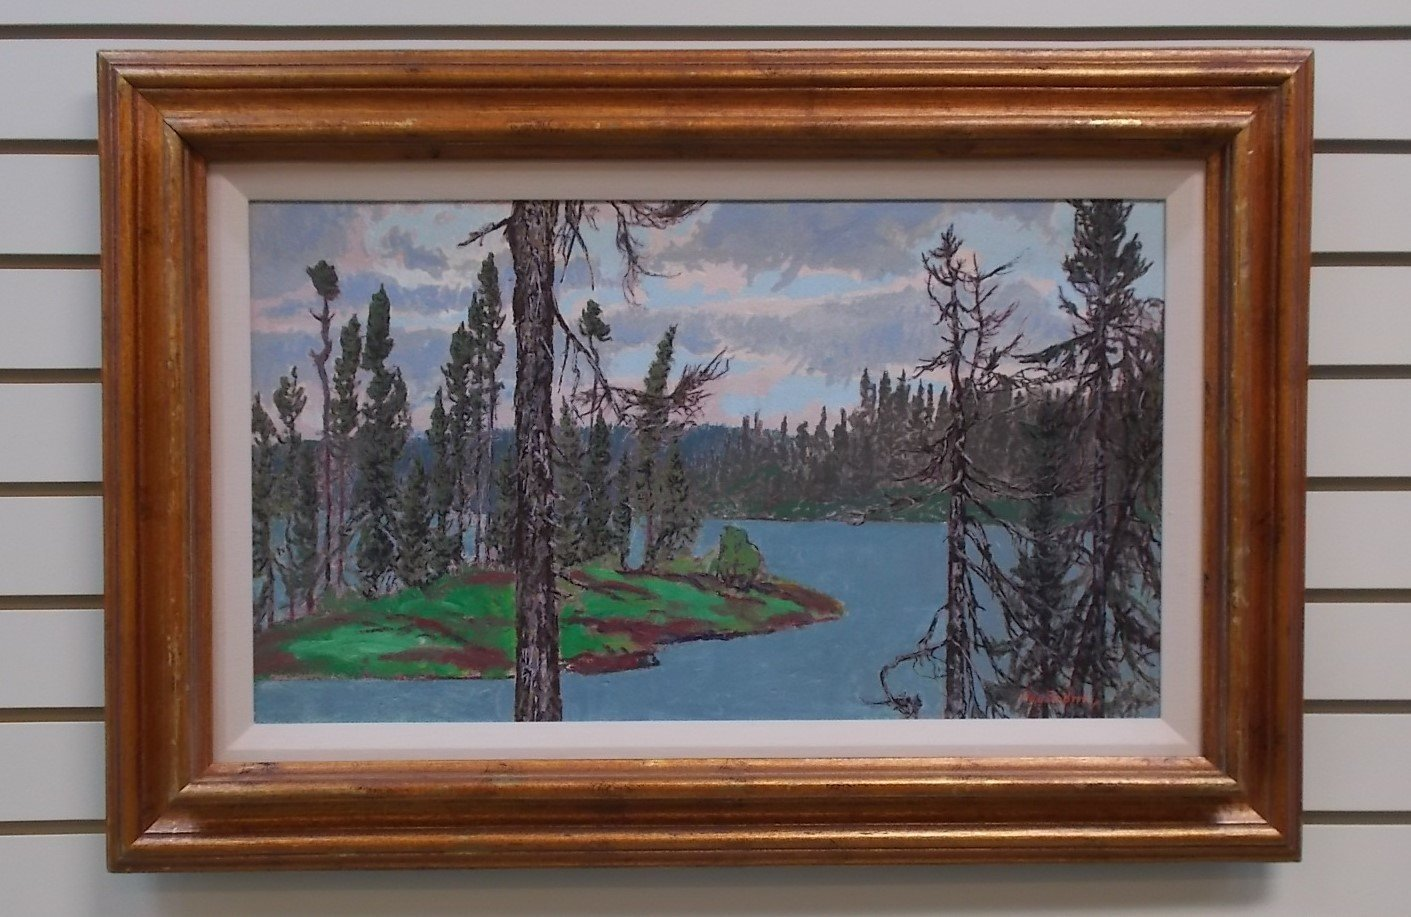 October Lake in Morning by Paul Rodrik